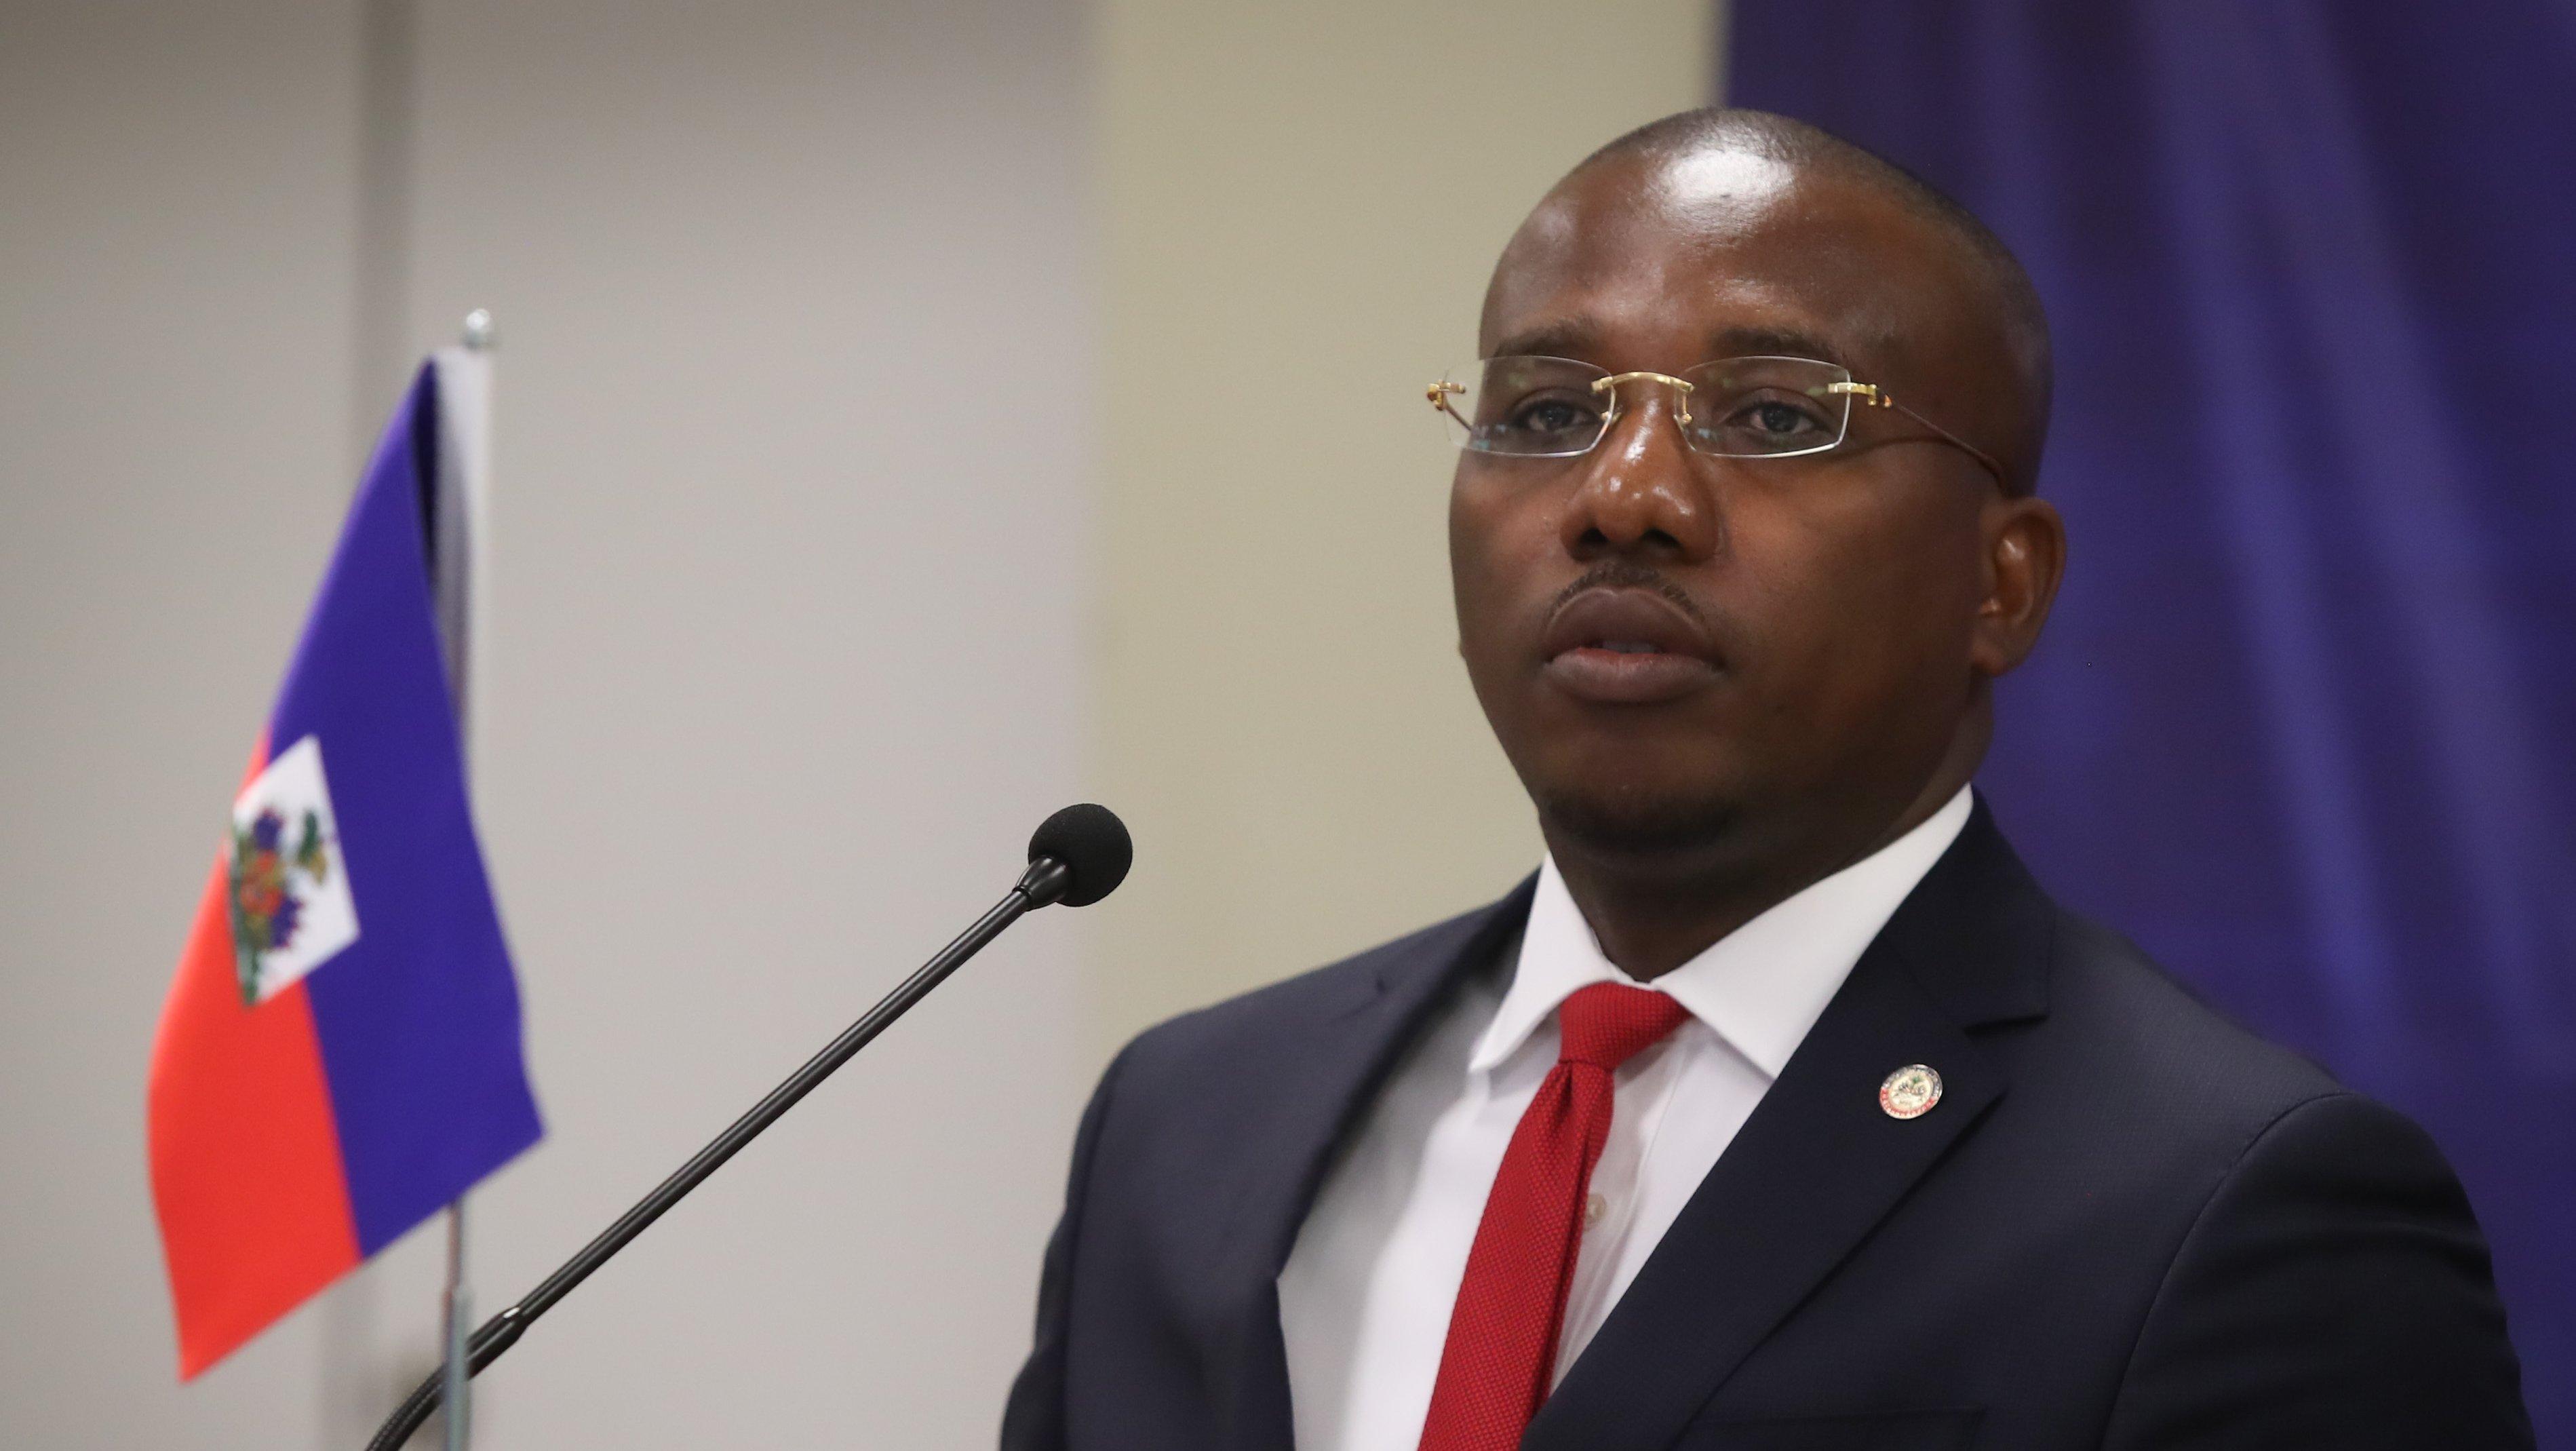 Turkish Foreign Minister Mevlut Cavusoglu in Haiti